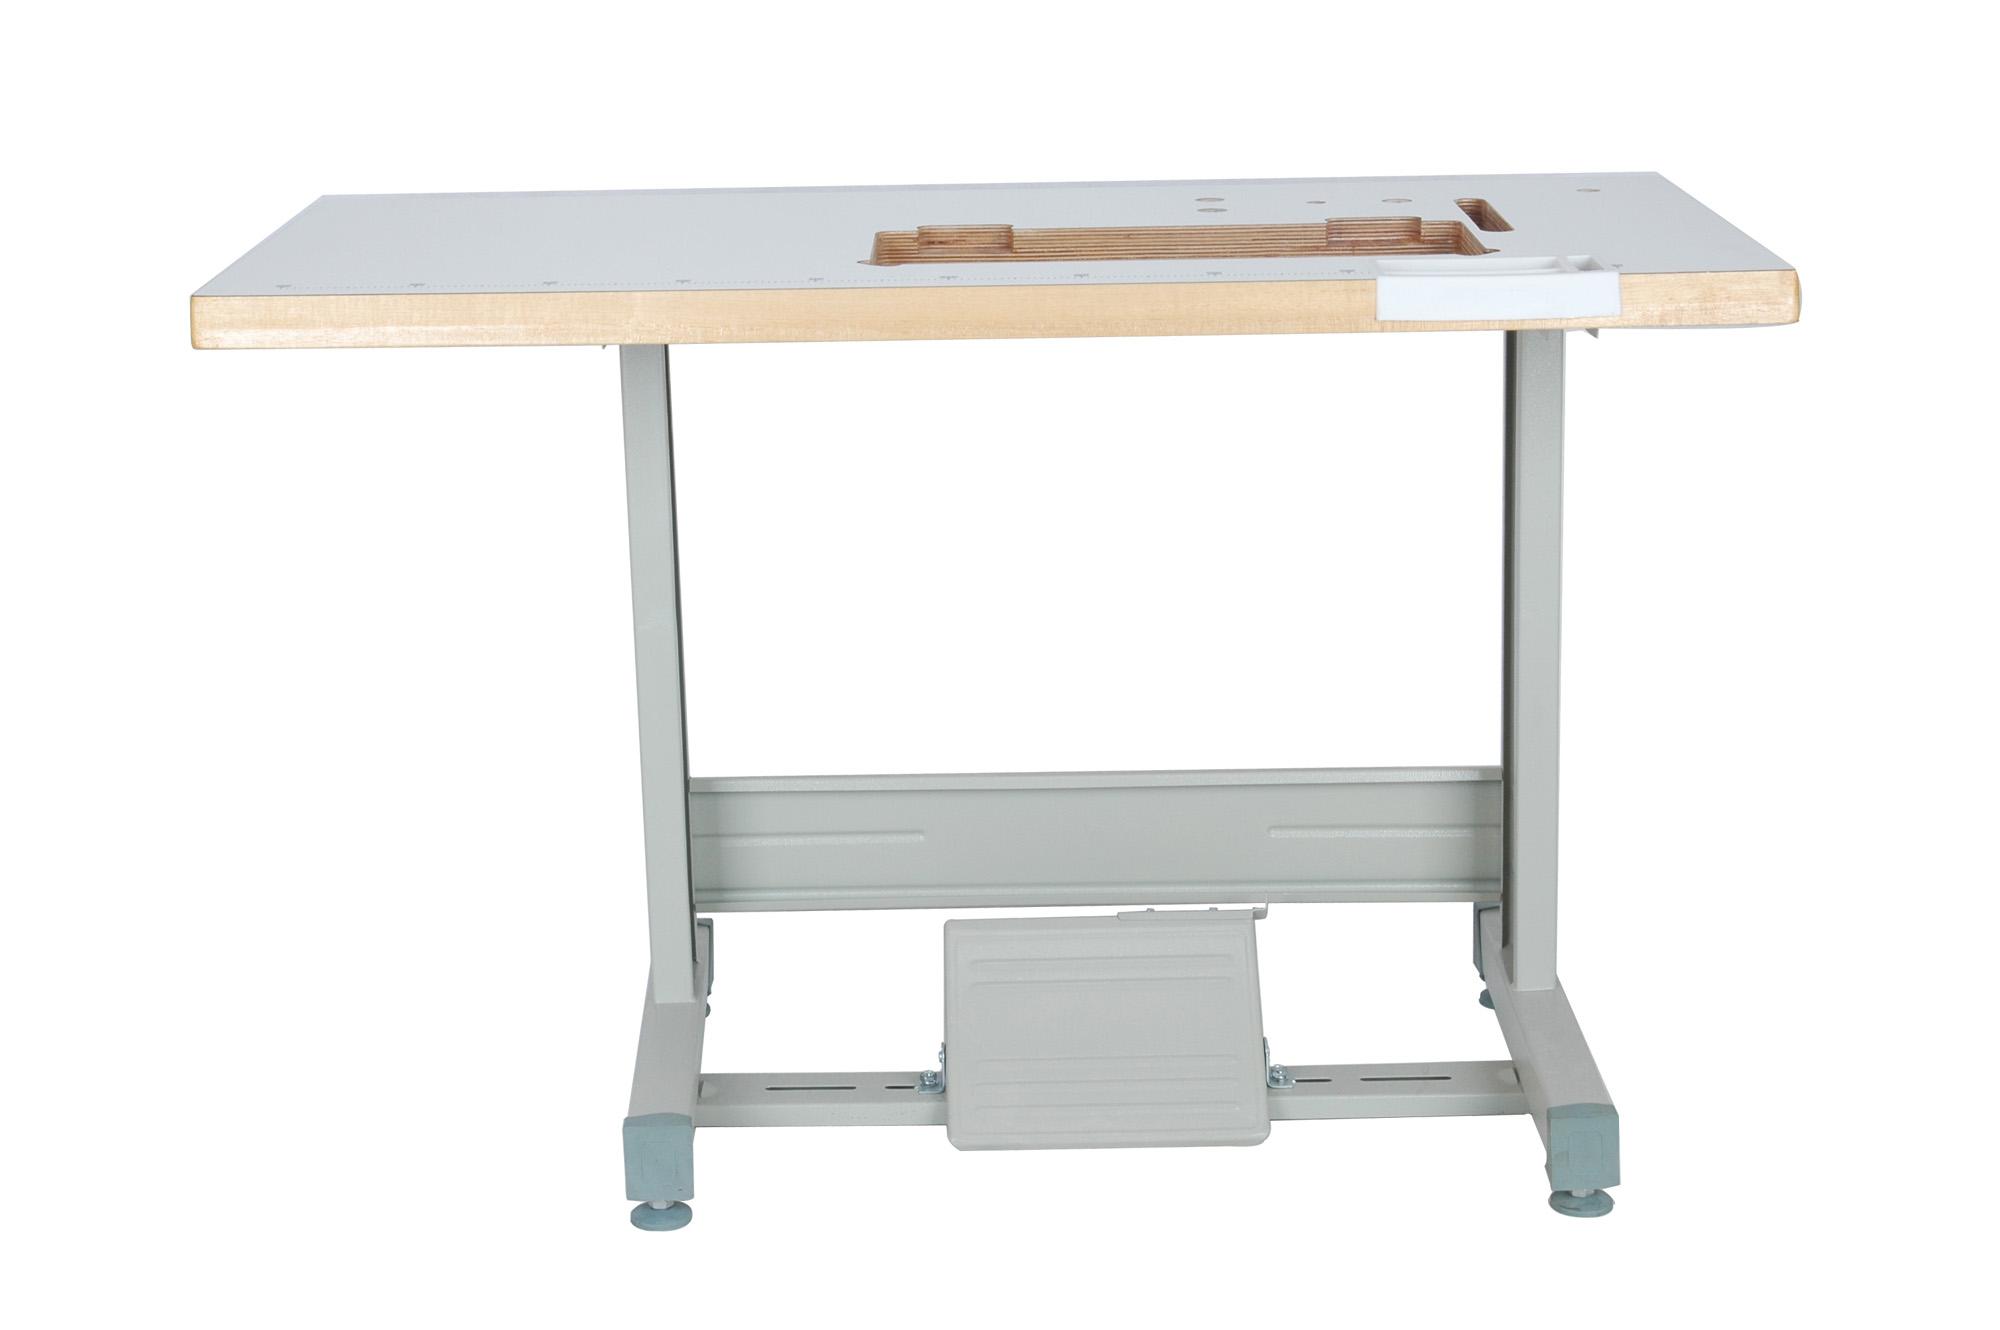 Coches manuales mesa para maquina de coser industrial for Mesa para maquina de coser